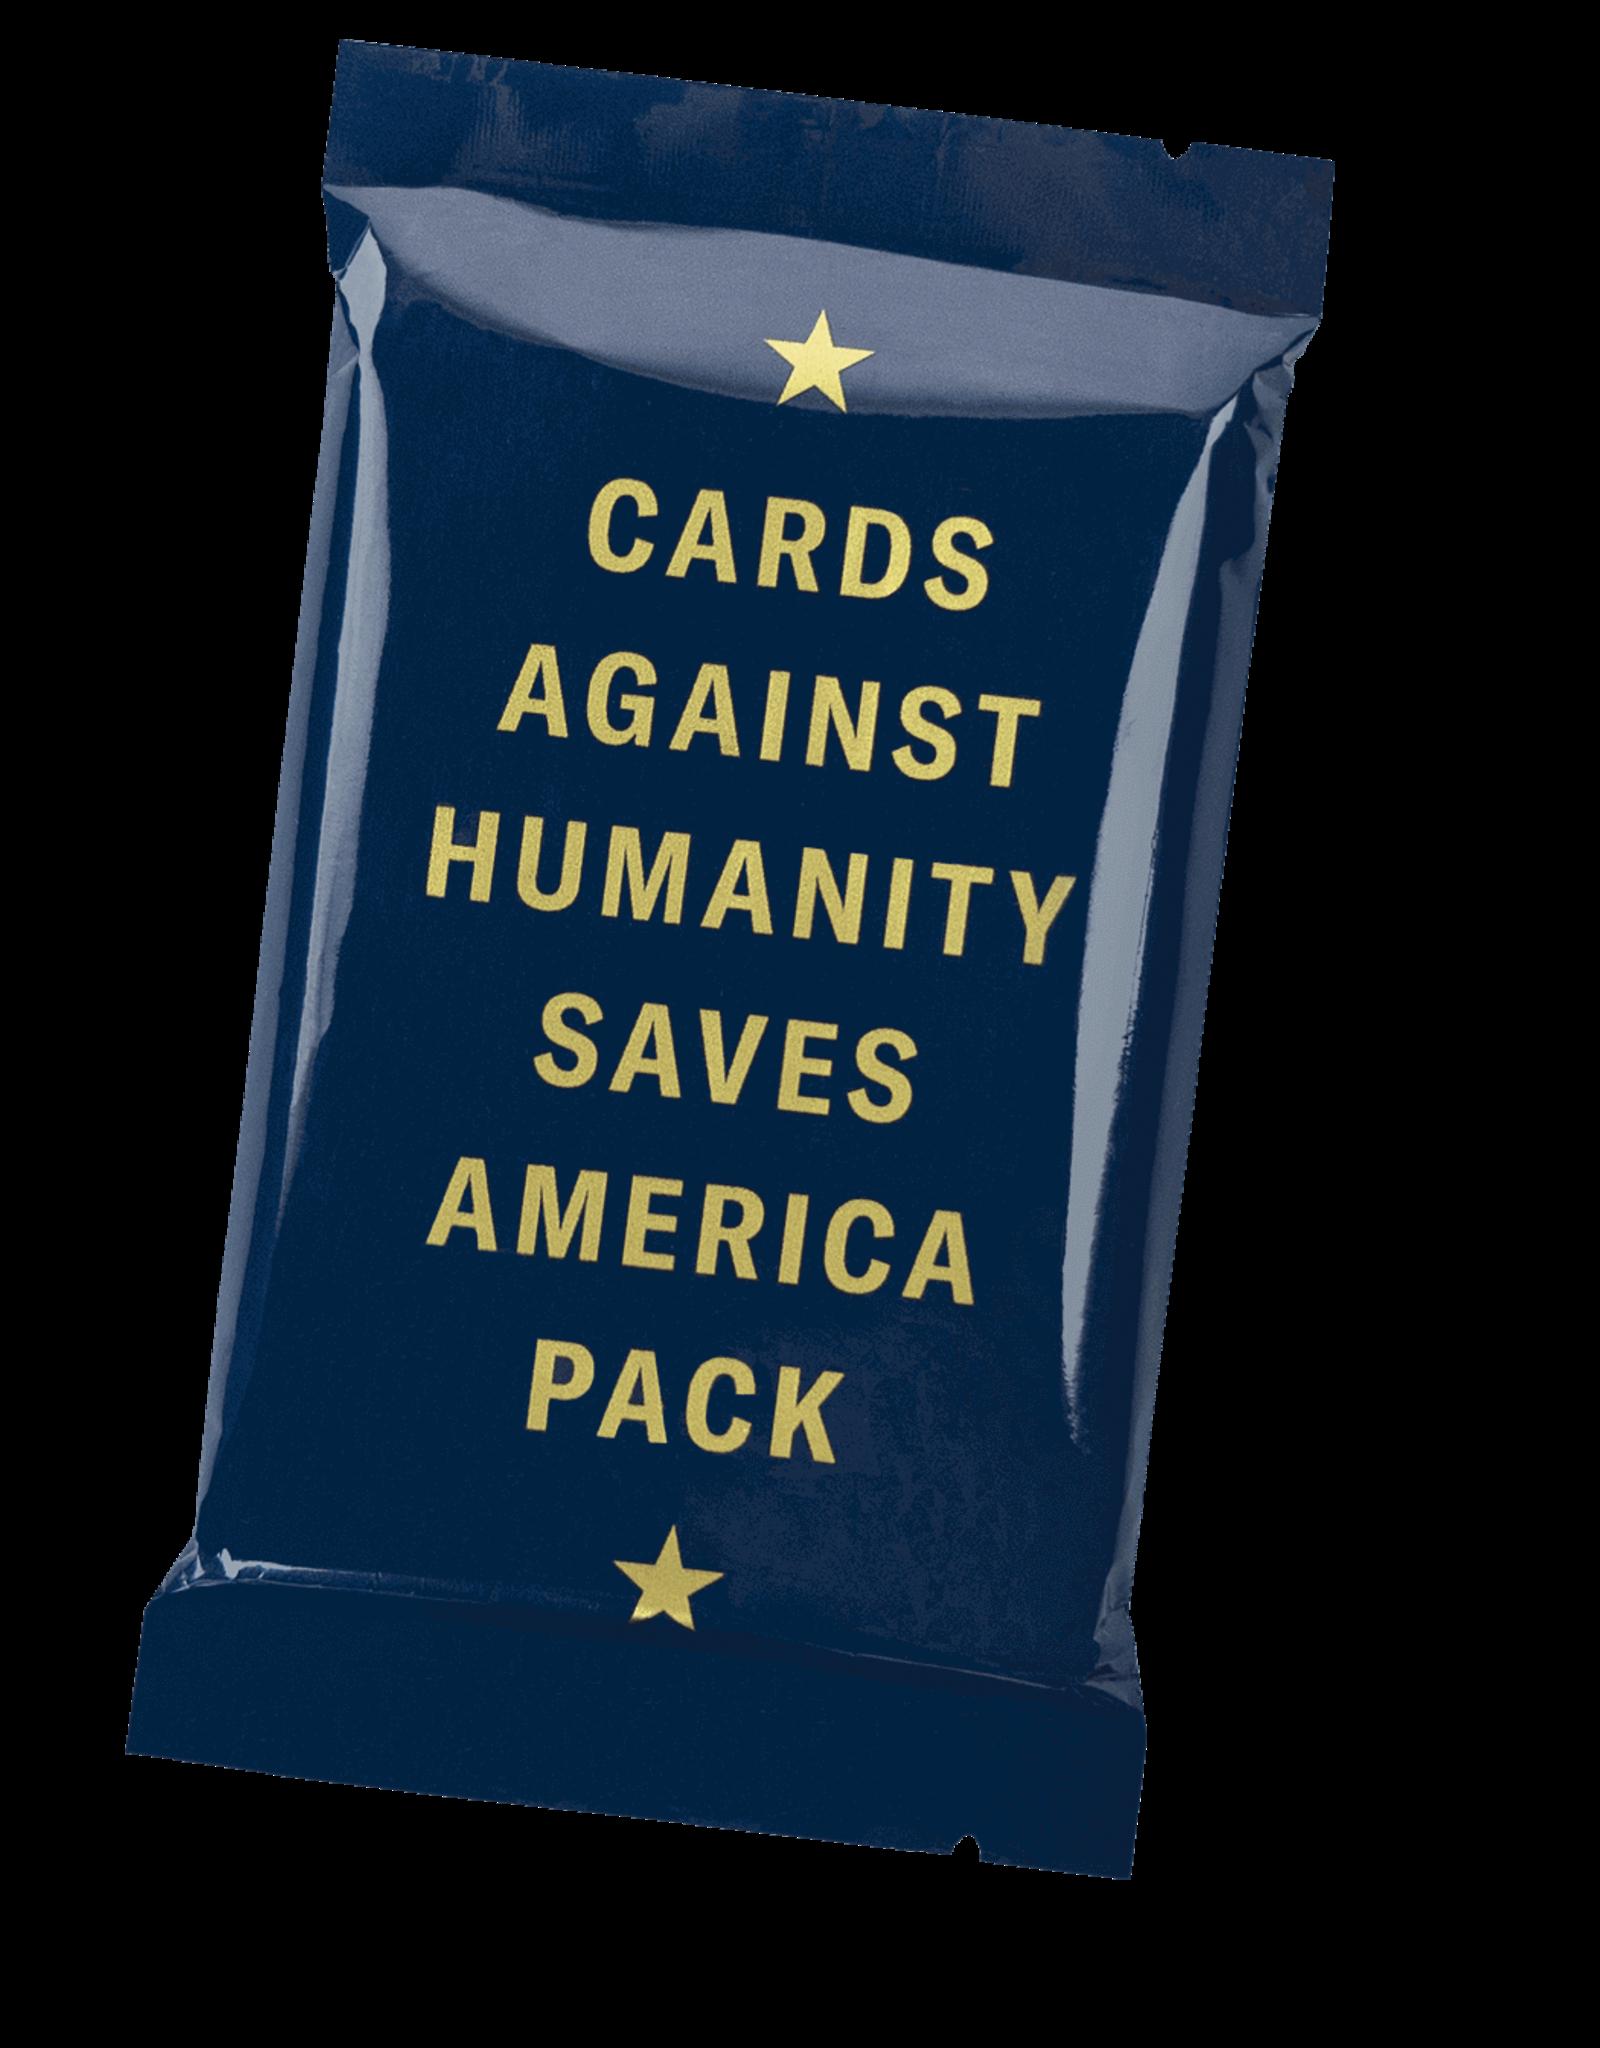 Cards Against Humanity Cards Against Humanity: CAH Saves America Pack